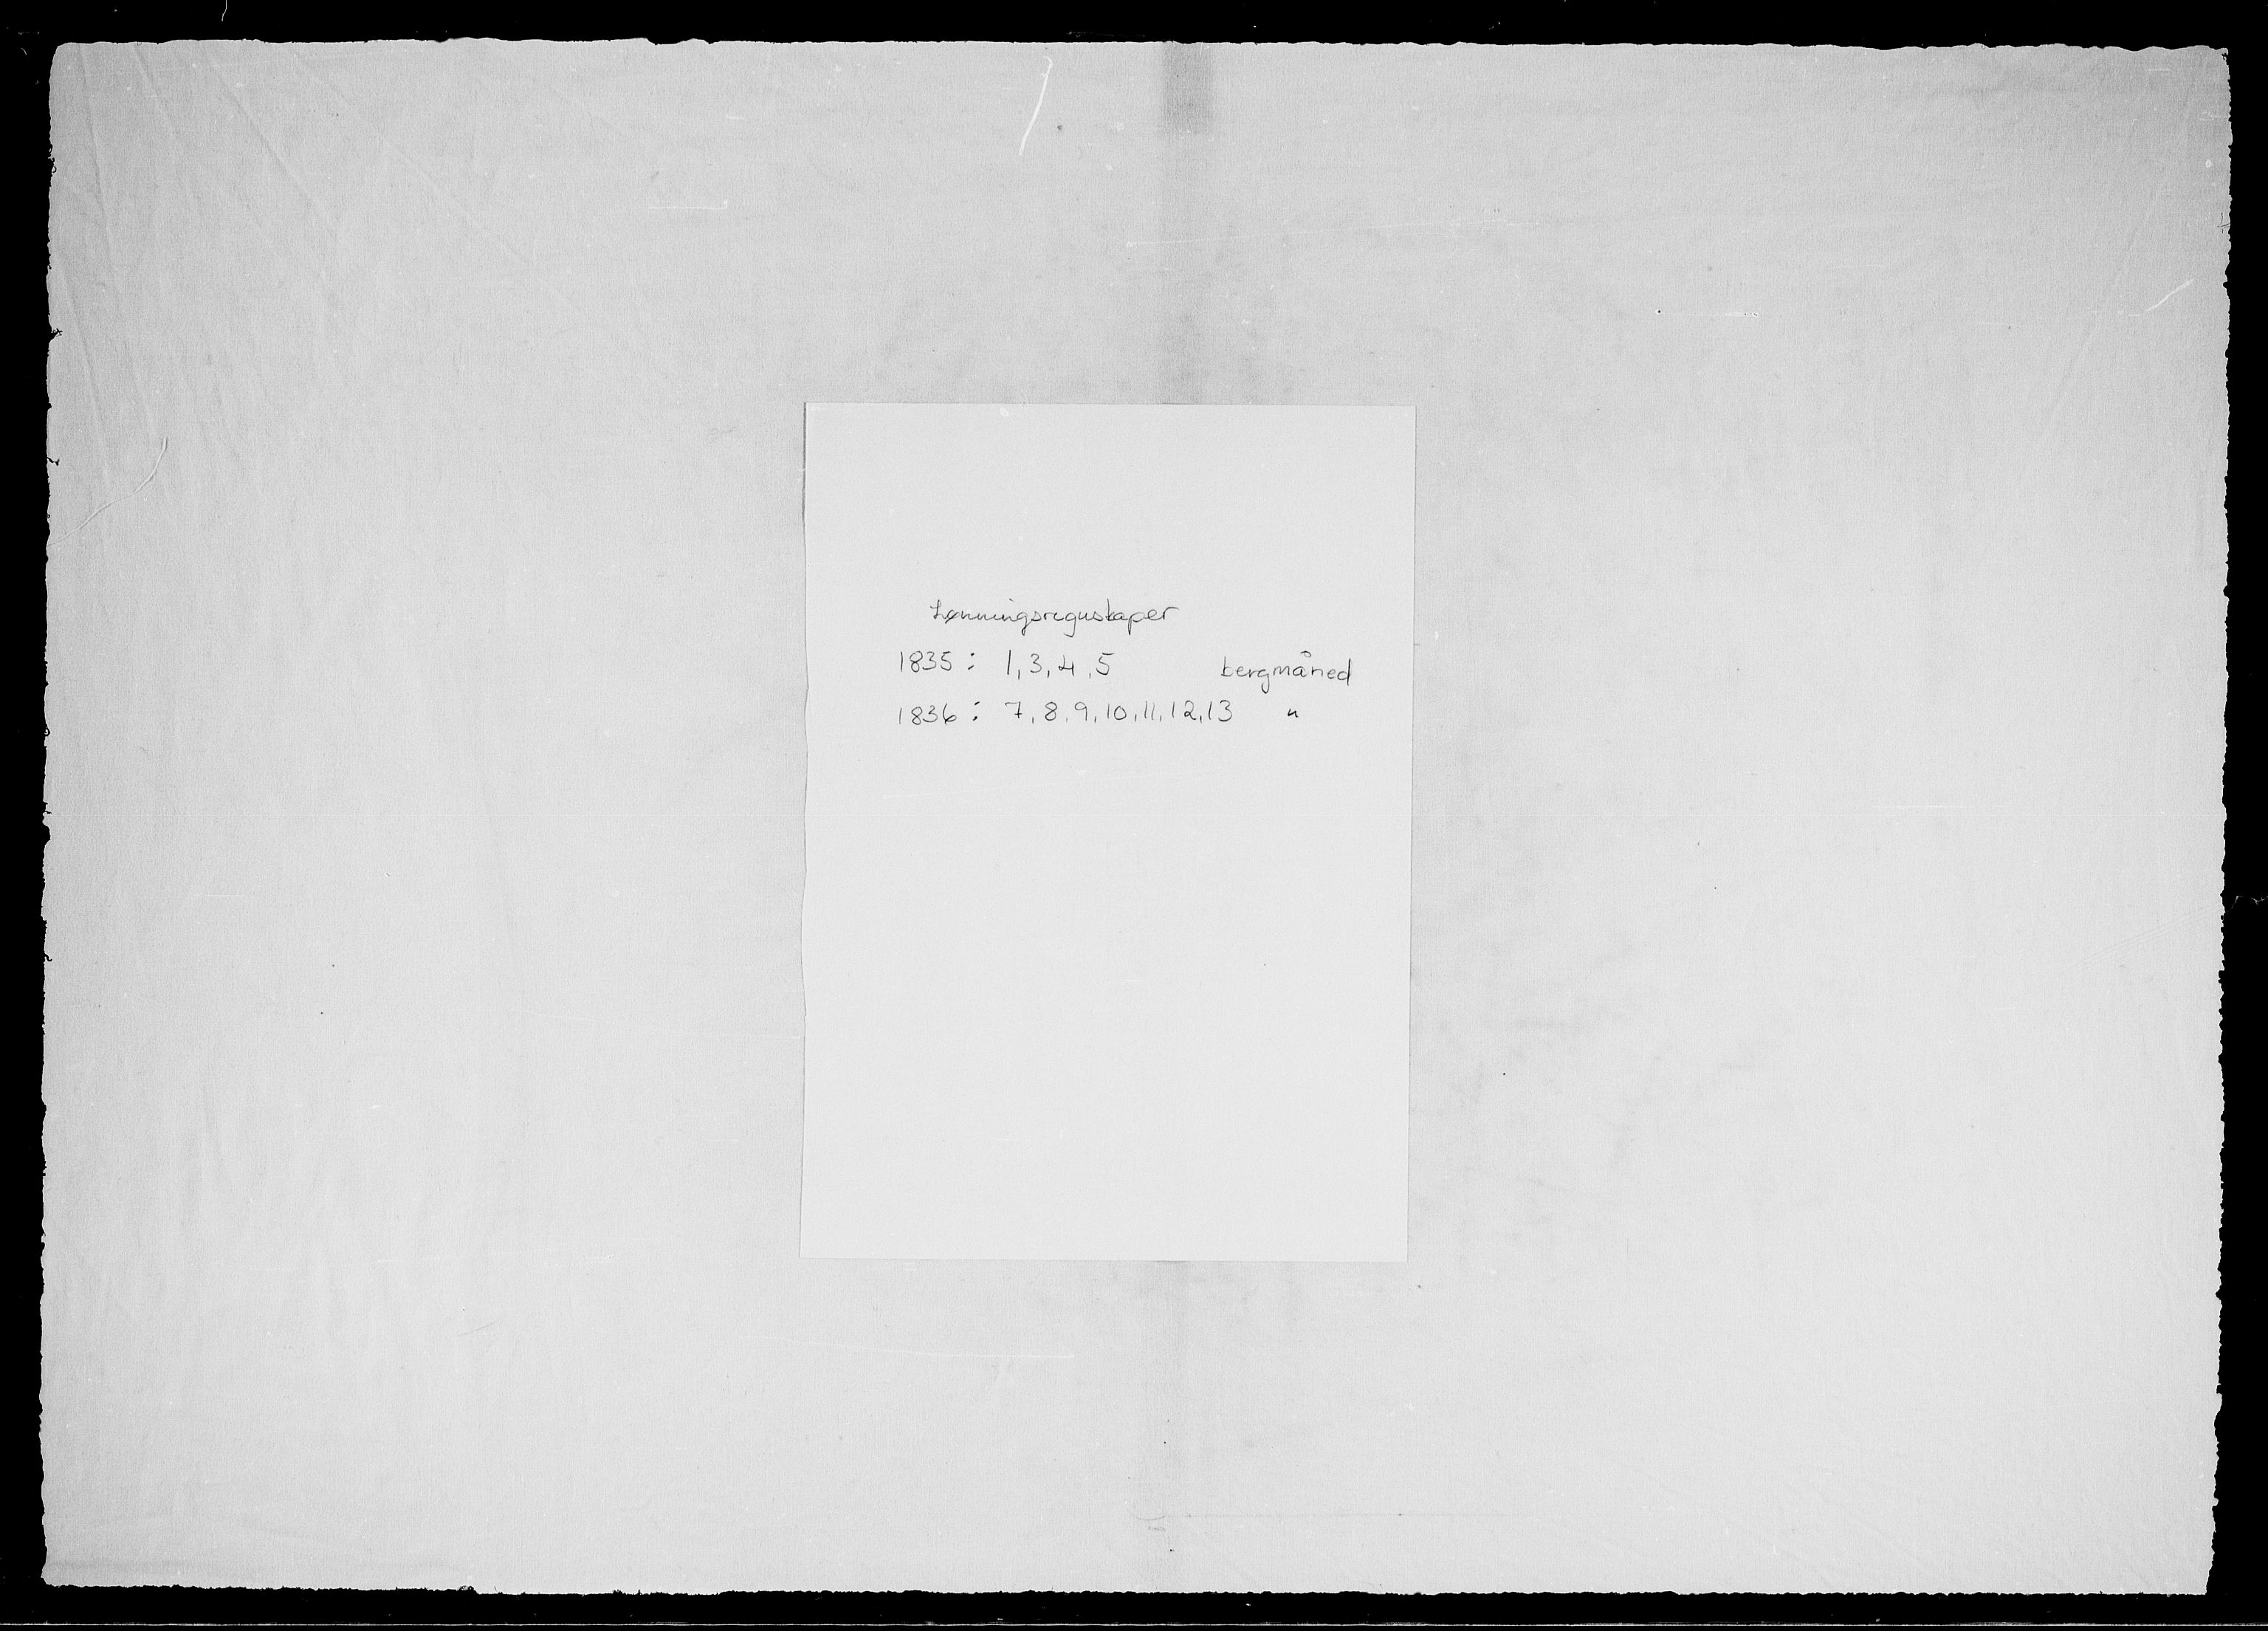 RA, Modums Blaafarveværk, G/Gd/Gdd/L0275, 1835-1836, s. 2